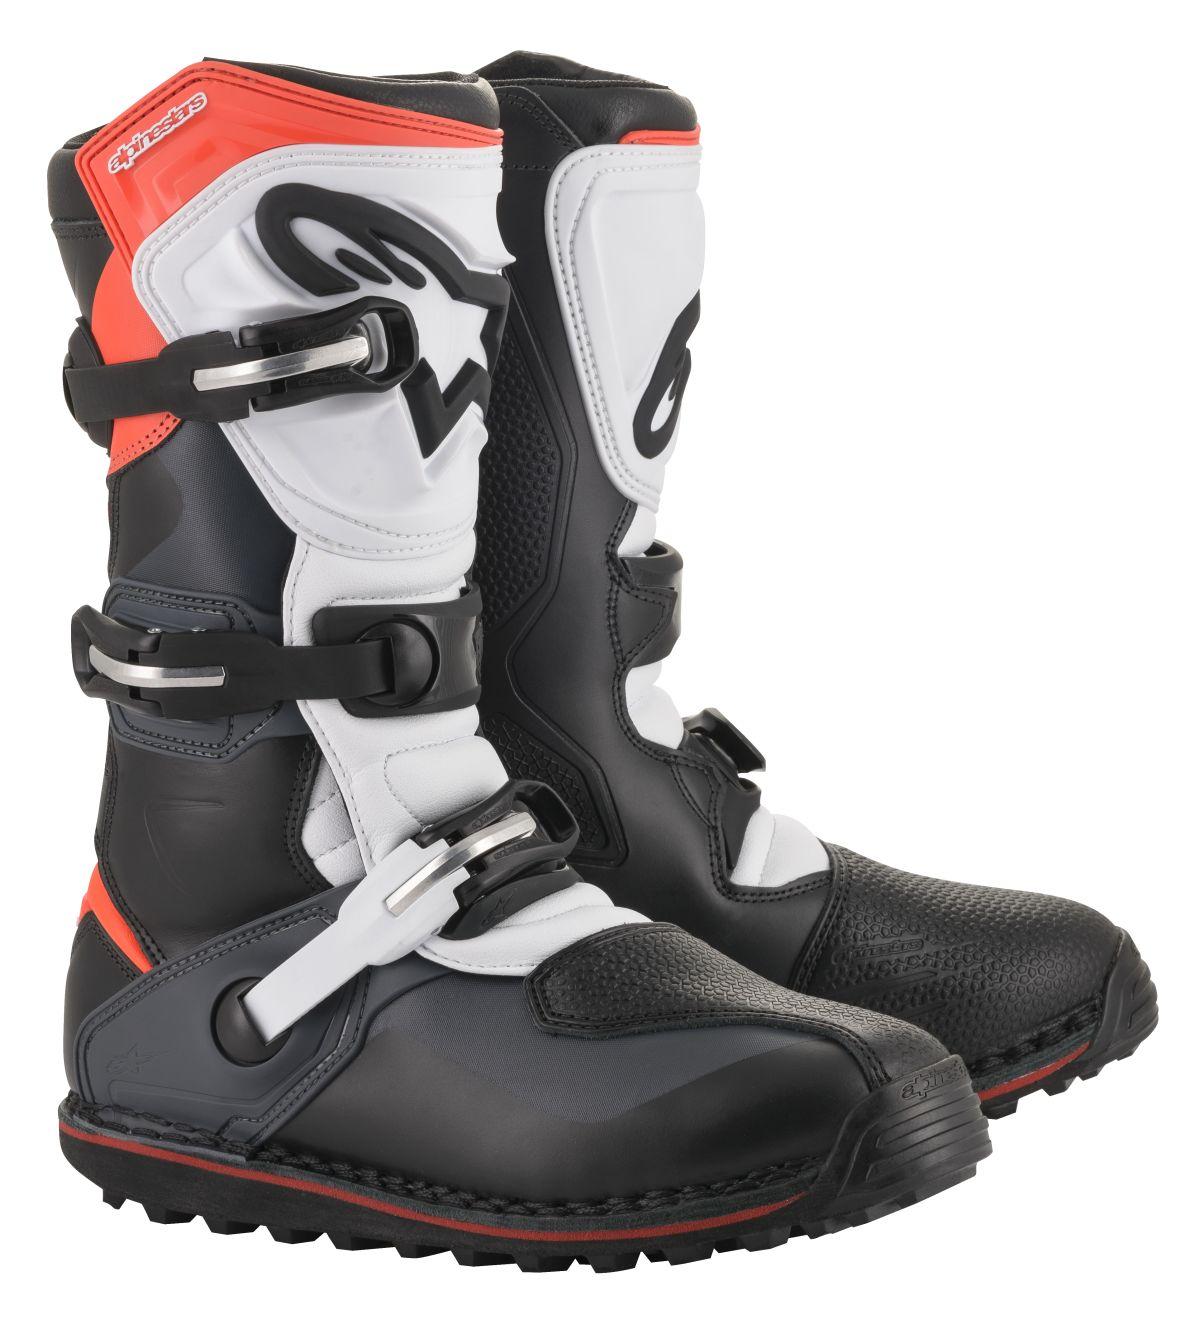 Alpinestars Enduro Laarzen TECH-T BK/GY/RD 12